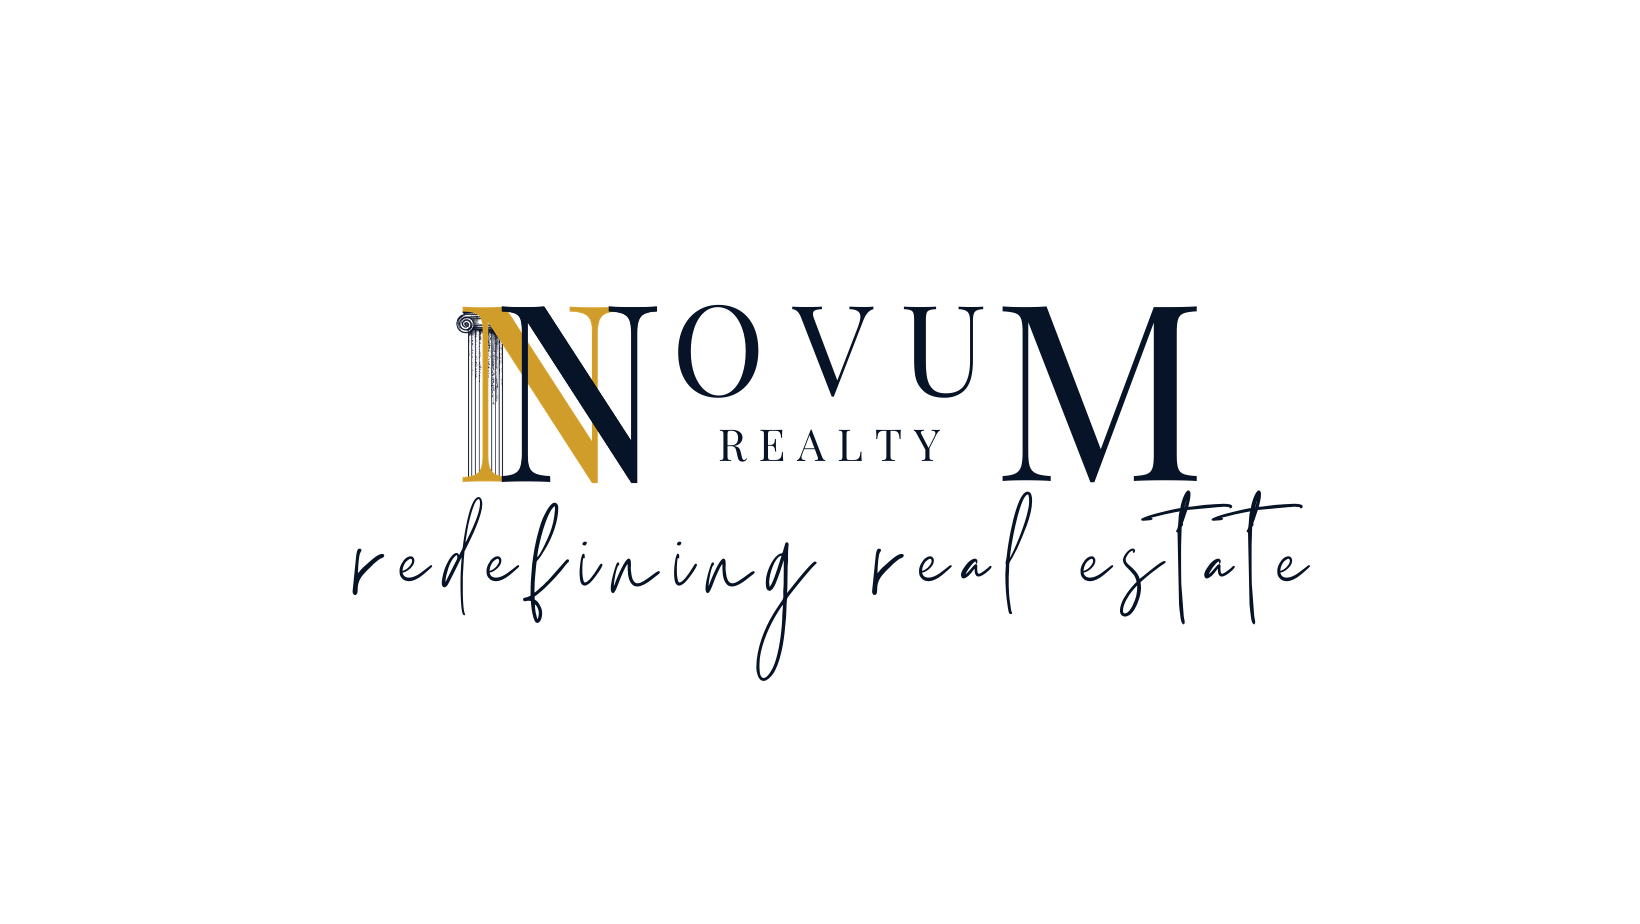 Novum Realty